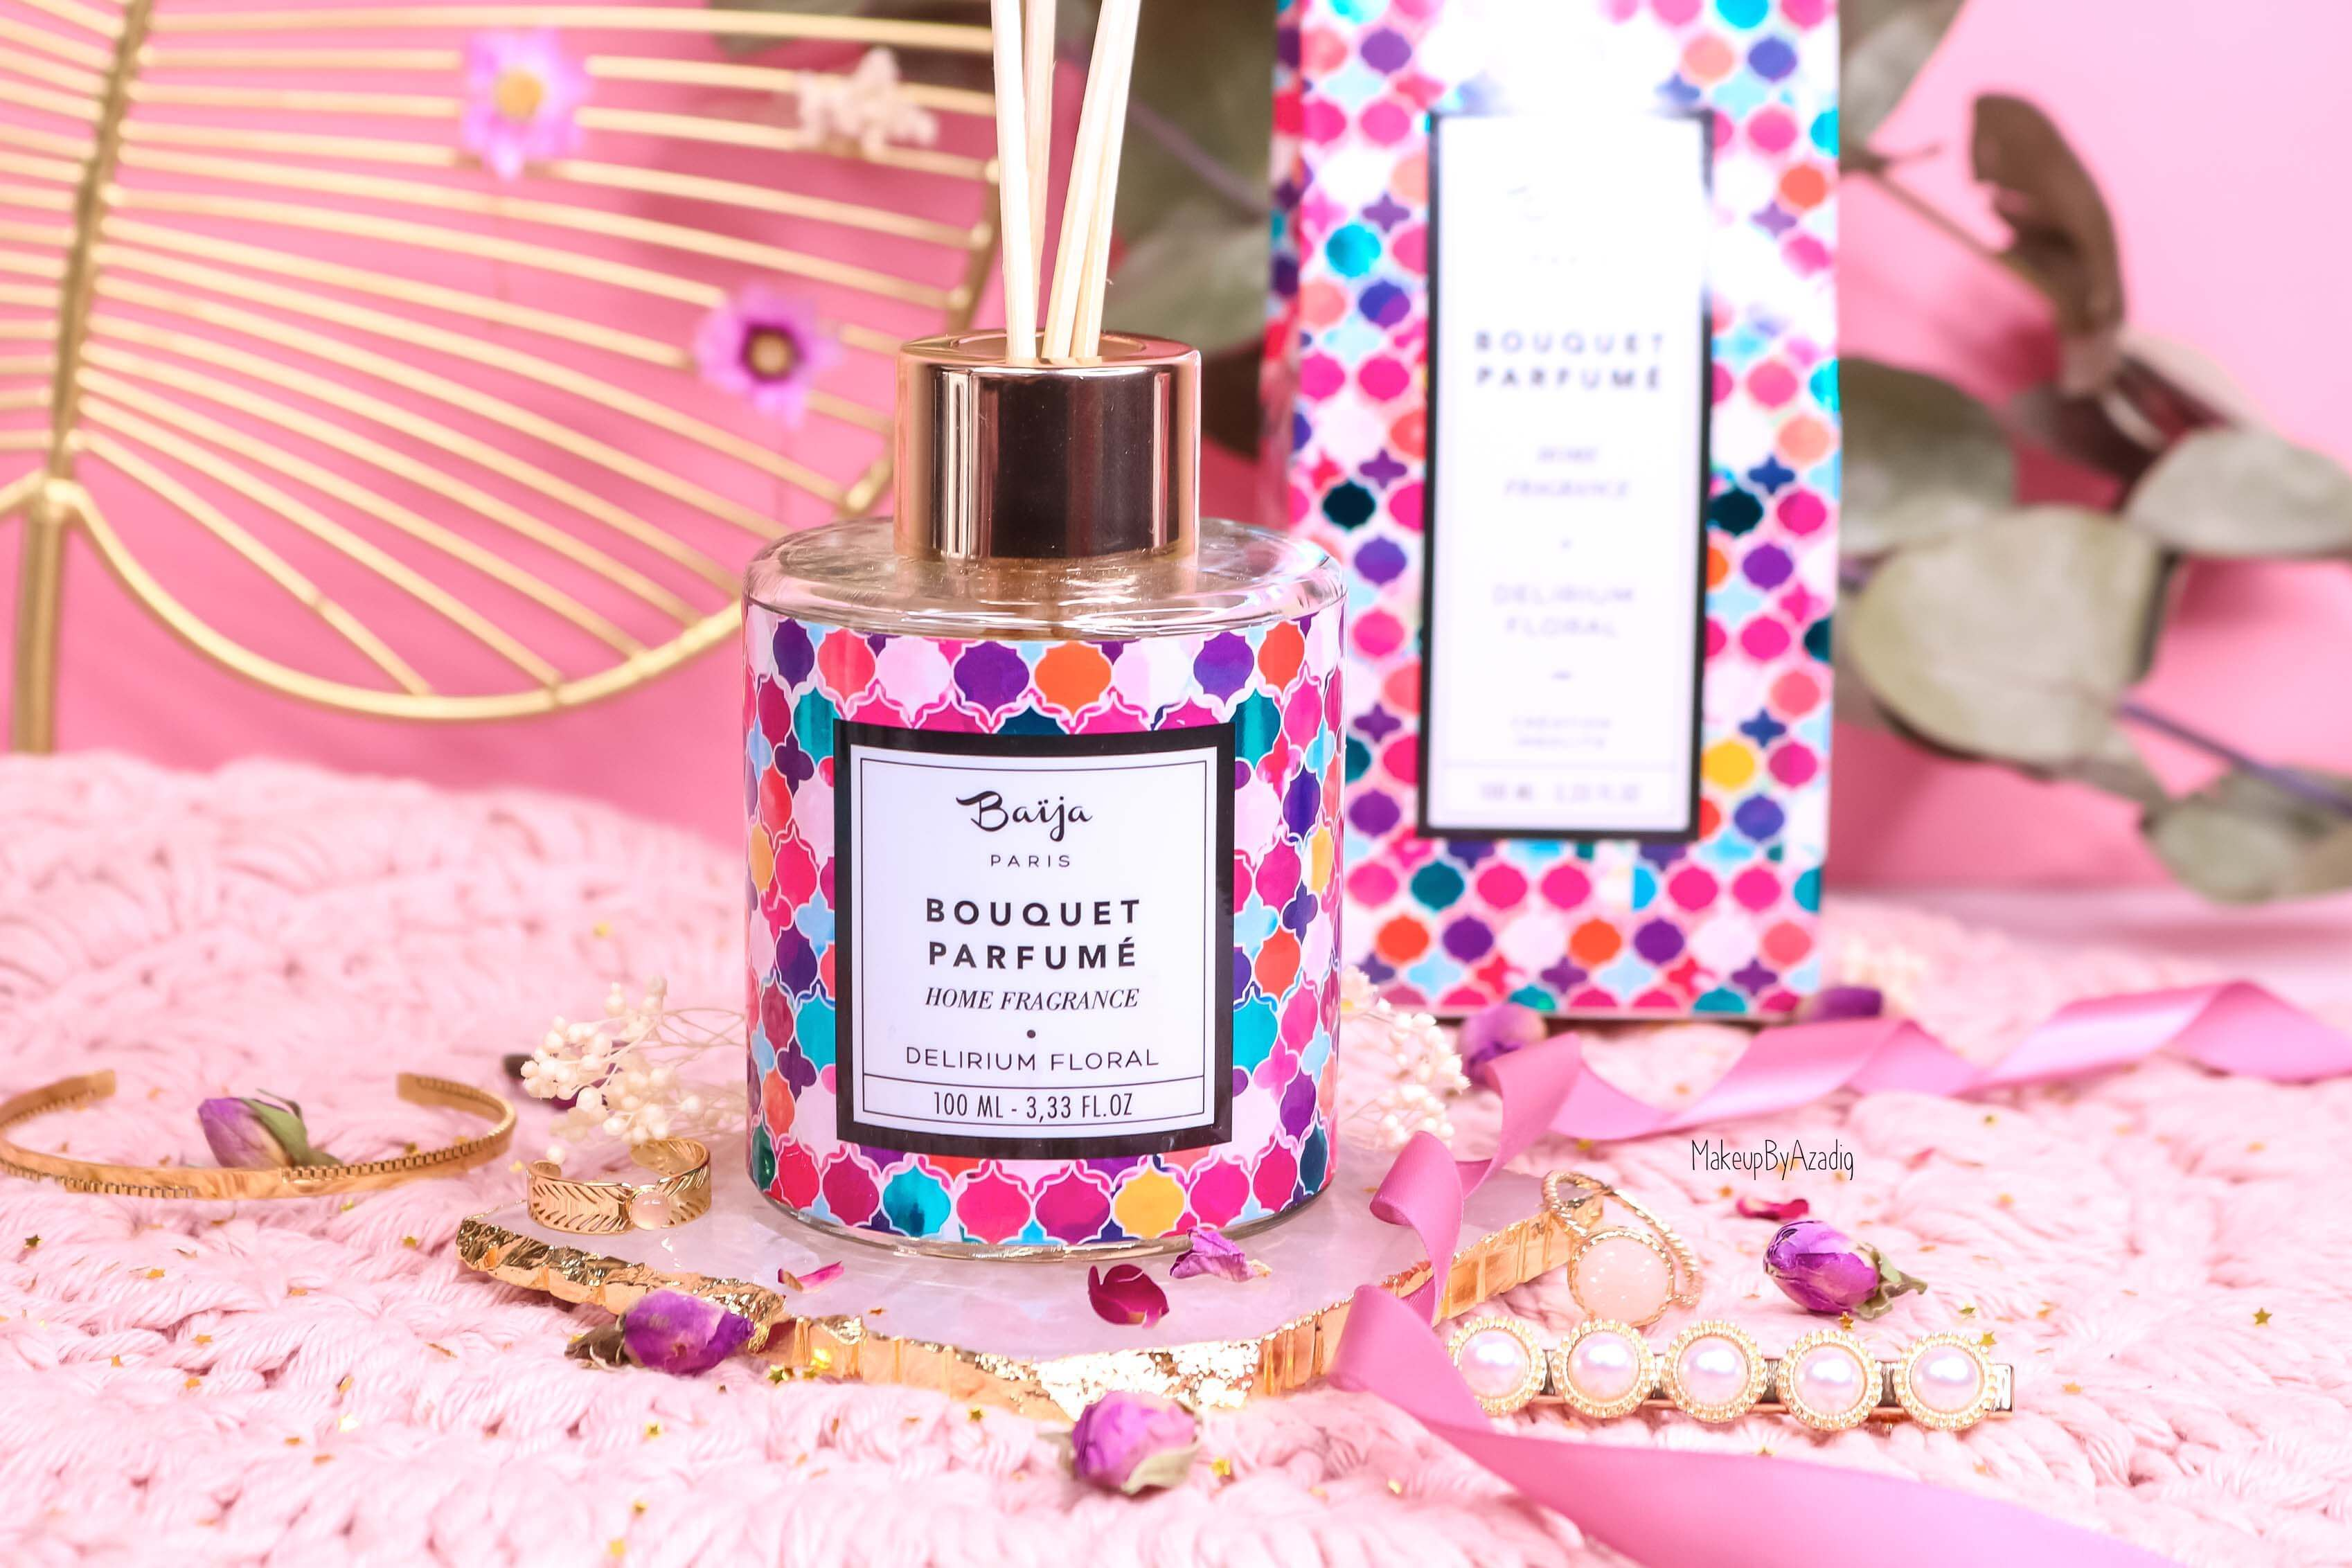 revue-collection-delirium-floral-baija-paris-corps-bougie-gommage-soin-fleurs-makeupbyazadig-avis-prix-sephora-fleur